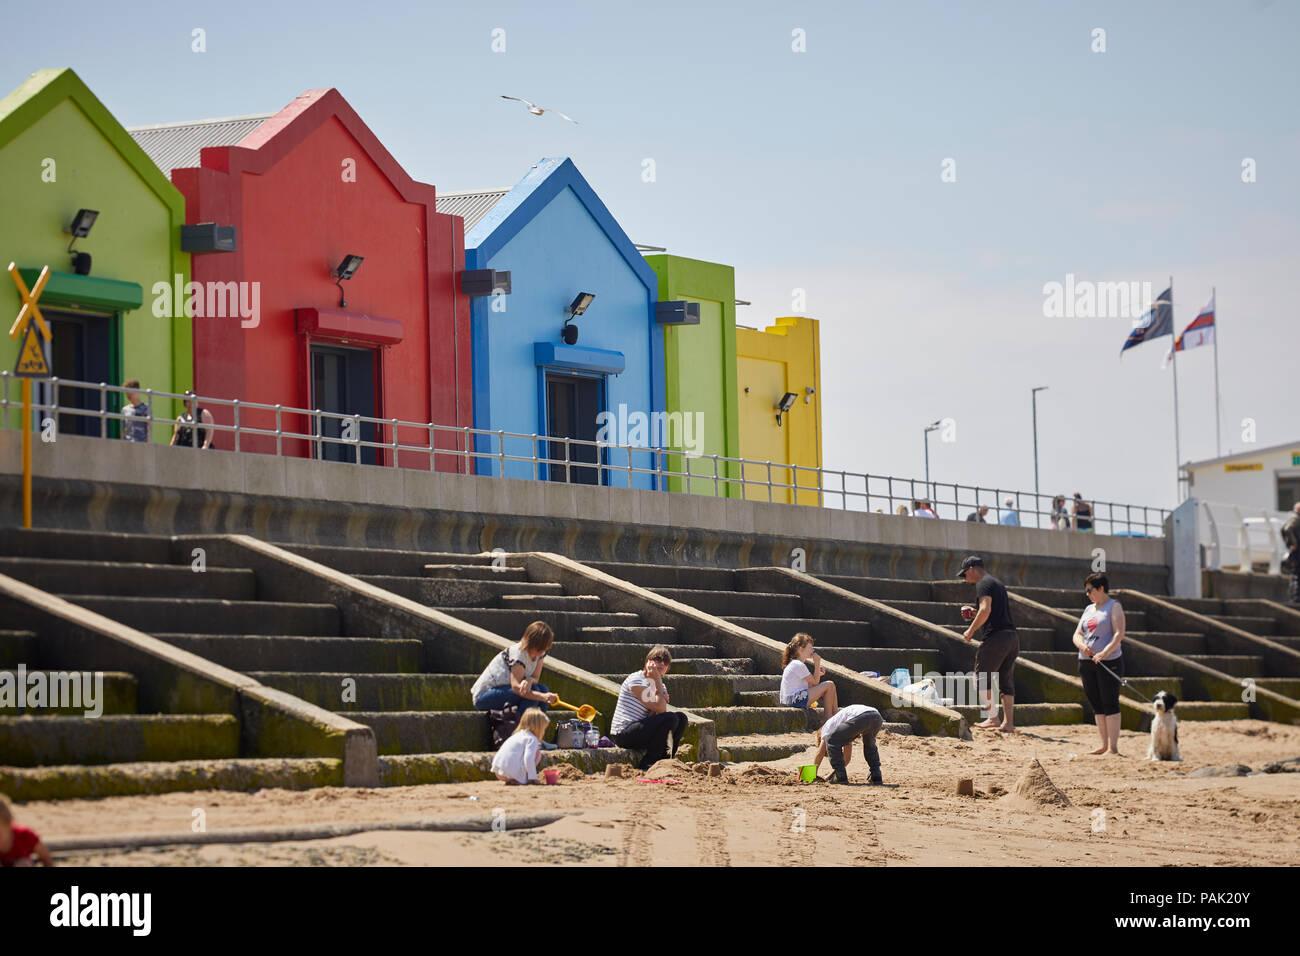 Prestatyn seaside coatal resort town Denbighshire, Wales. Historically  Flintshire,  central beech shop bright colours - Stock Image